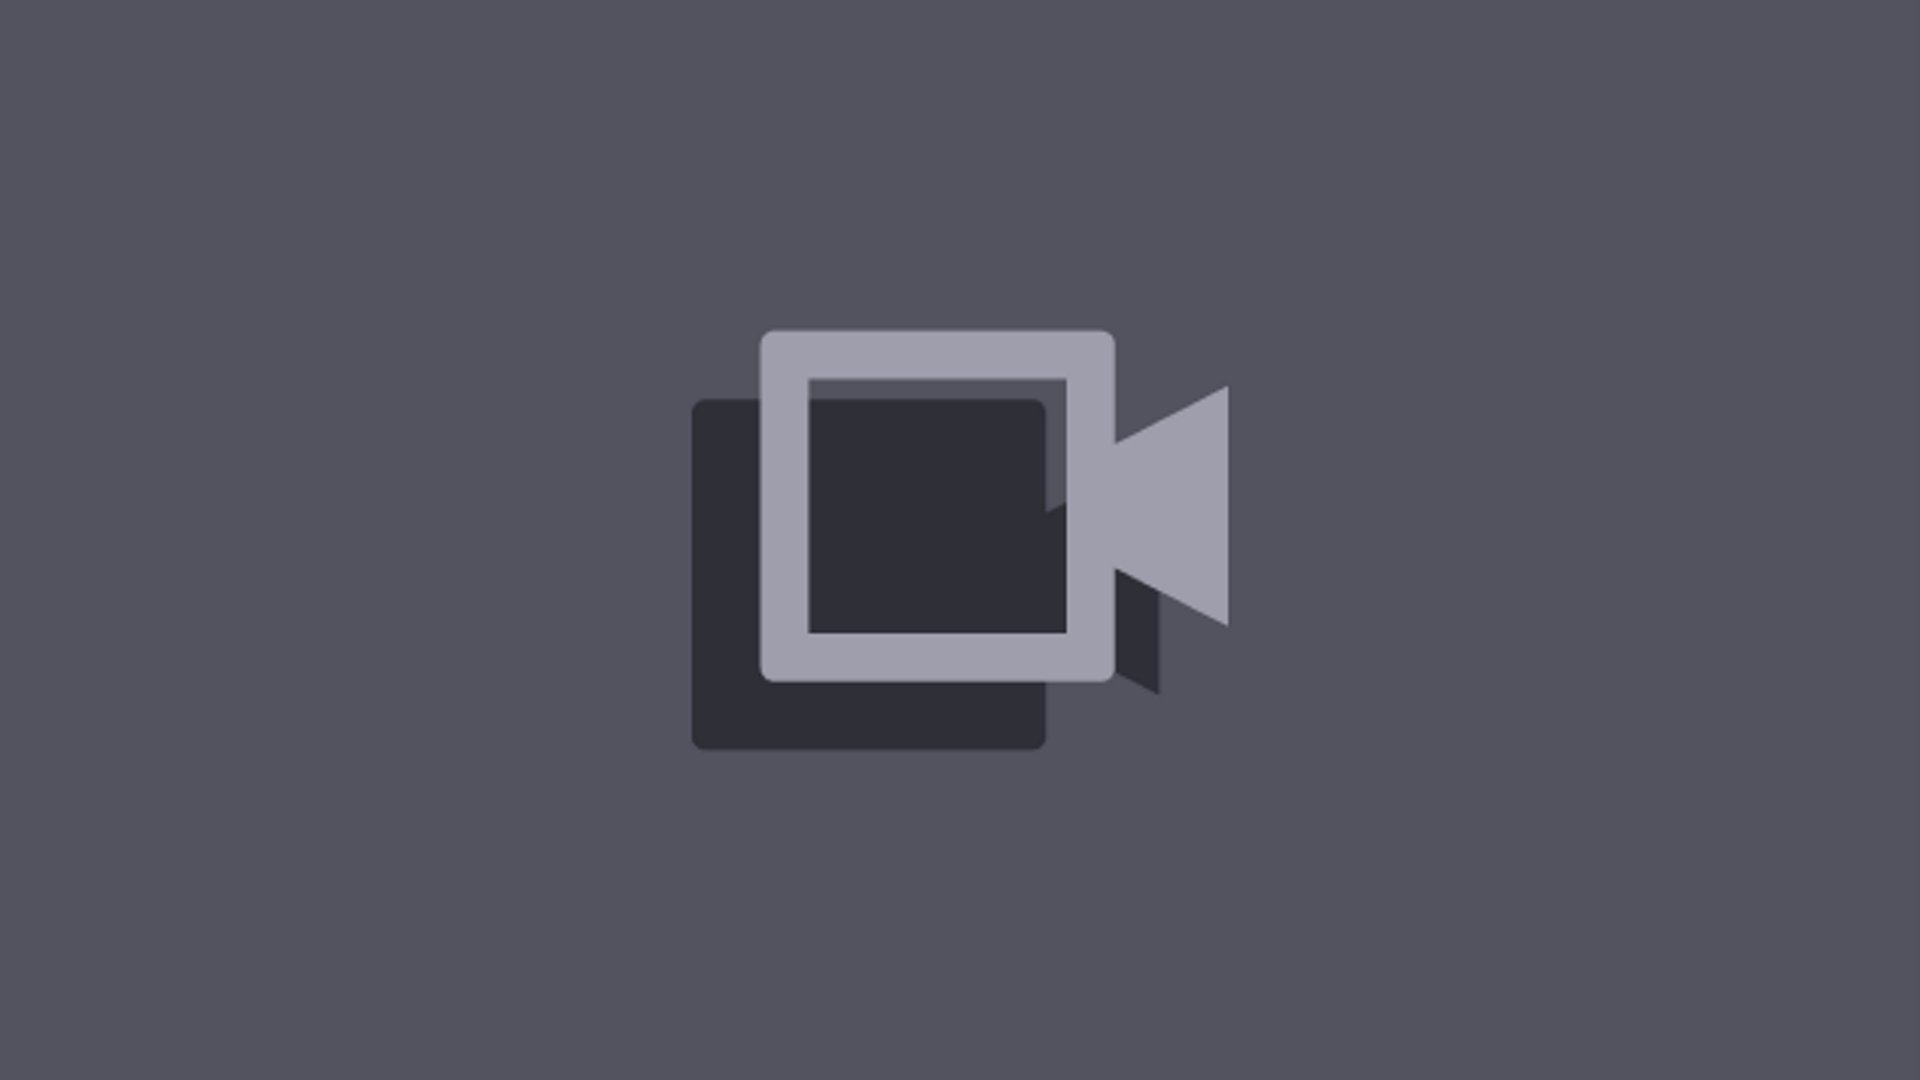 watch vinesauce stream twitch gaming top twitter youtube videos